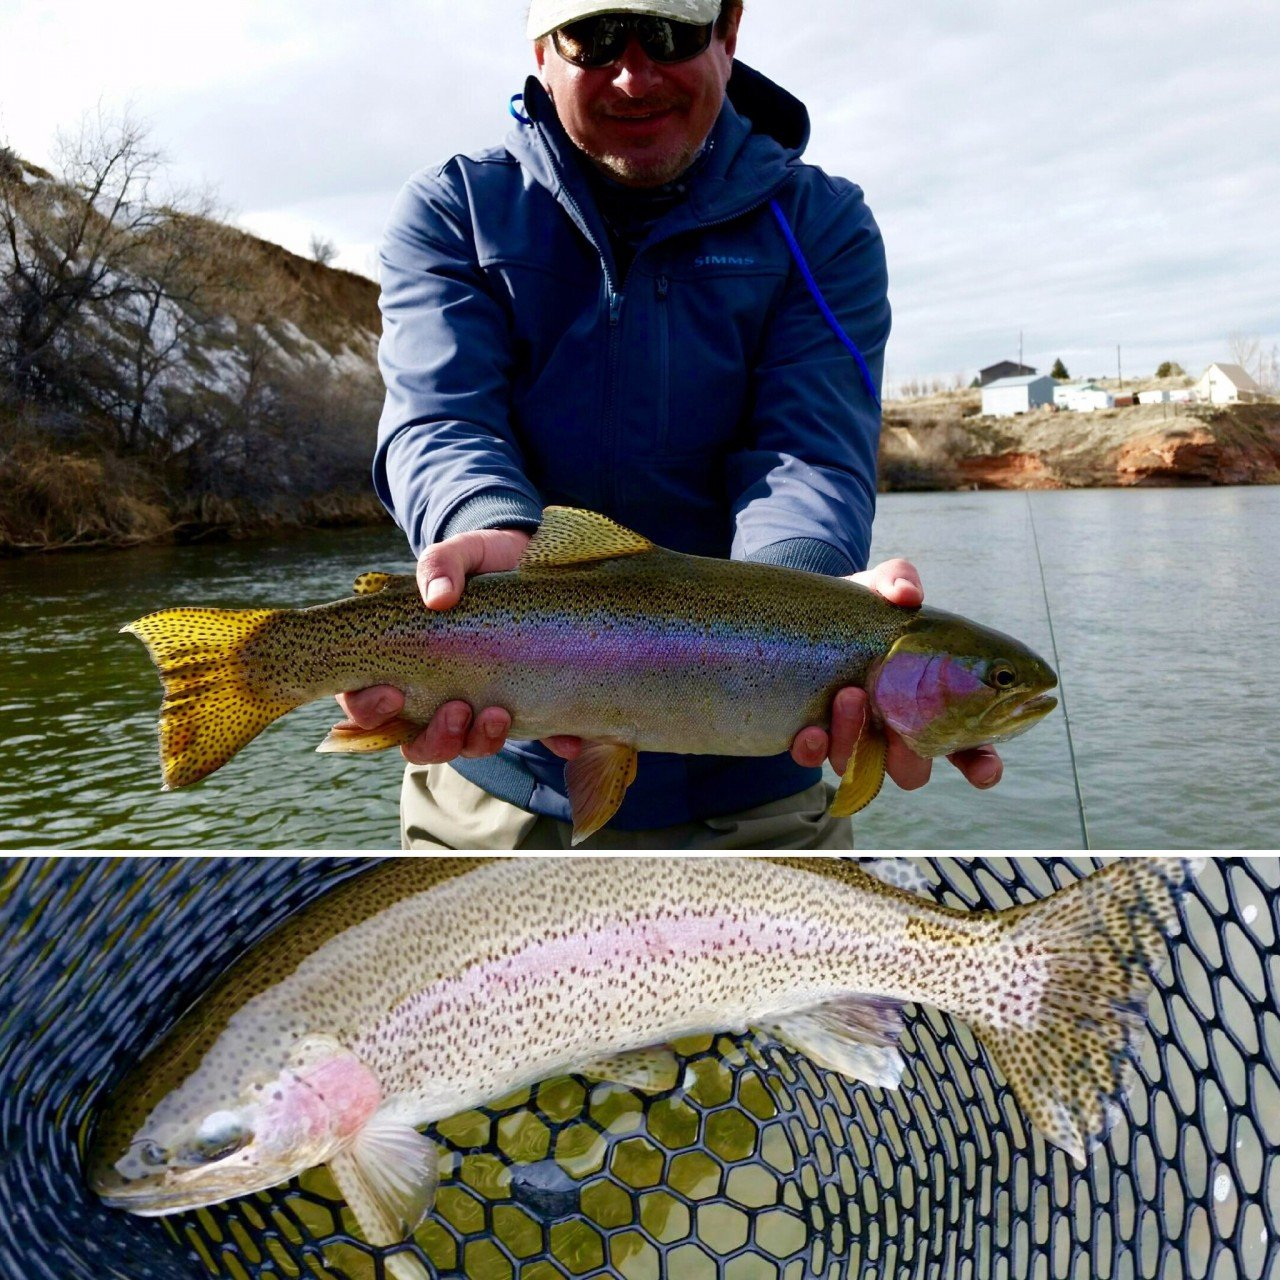 Bighorn river fishing report thermopolis wyoming for Bighorn river fishing